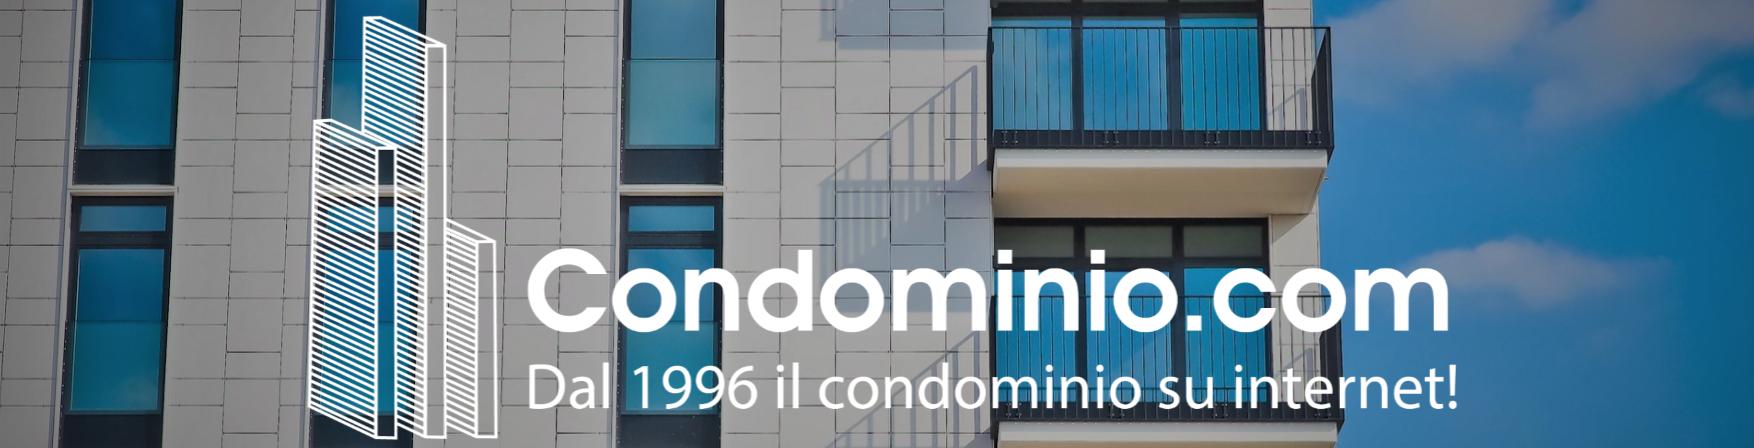 Condominio.com